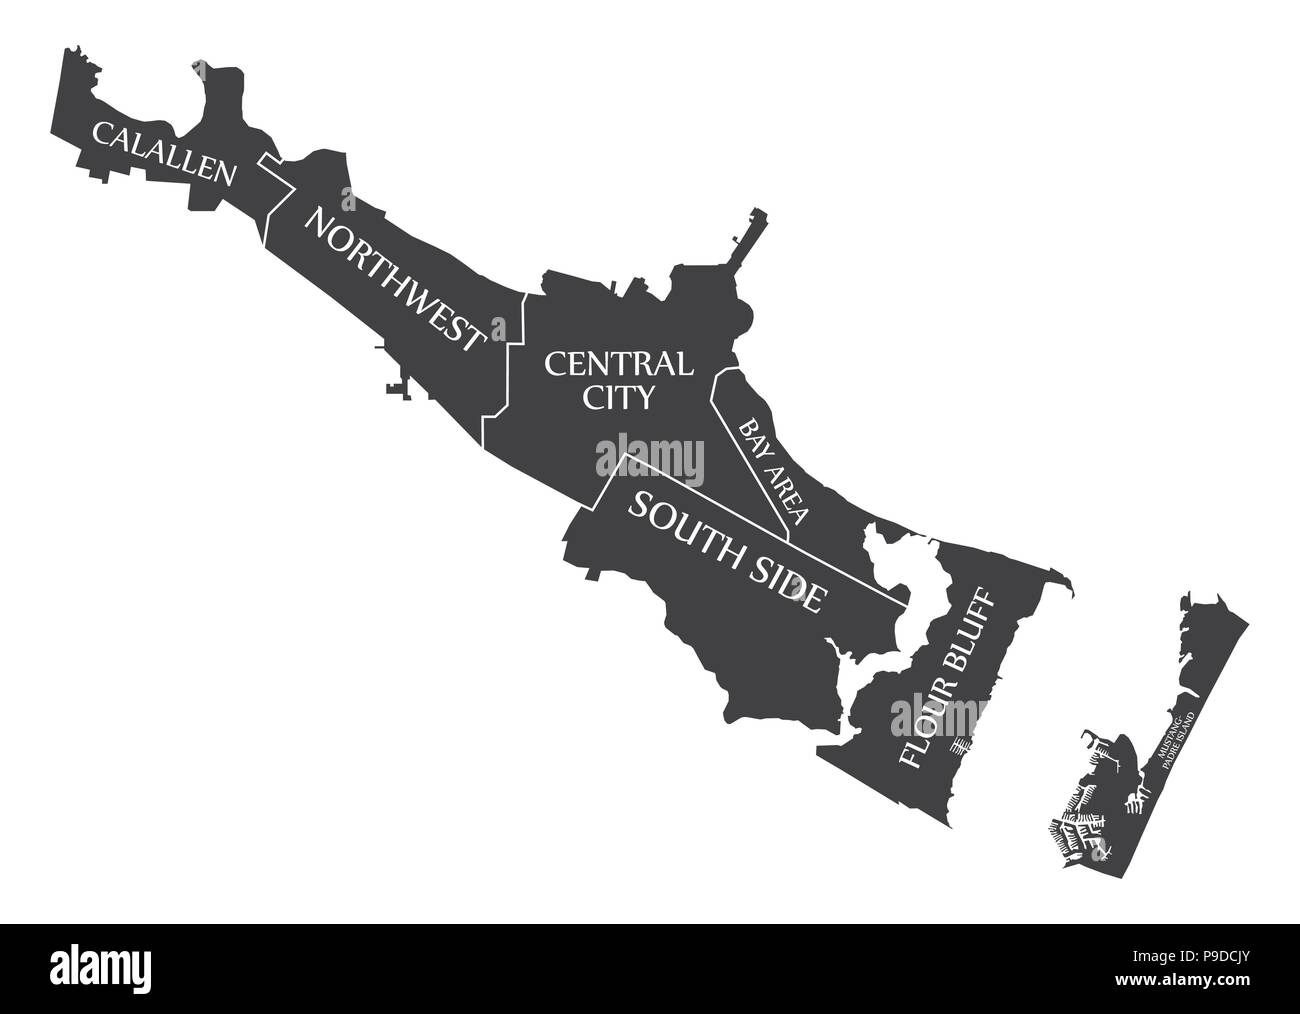 Corpus Christi Texas city map USA labelled black illustration - Stock Image